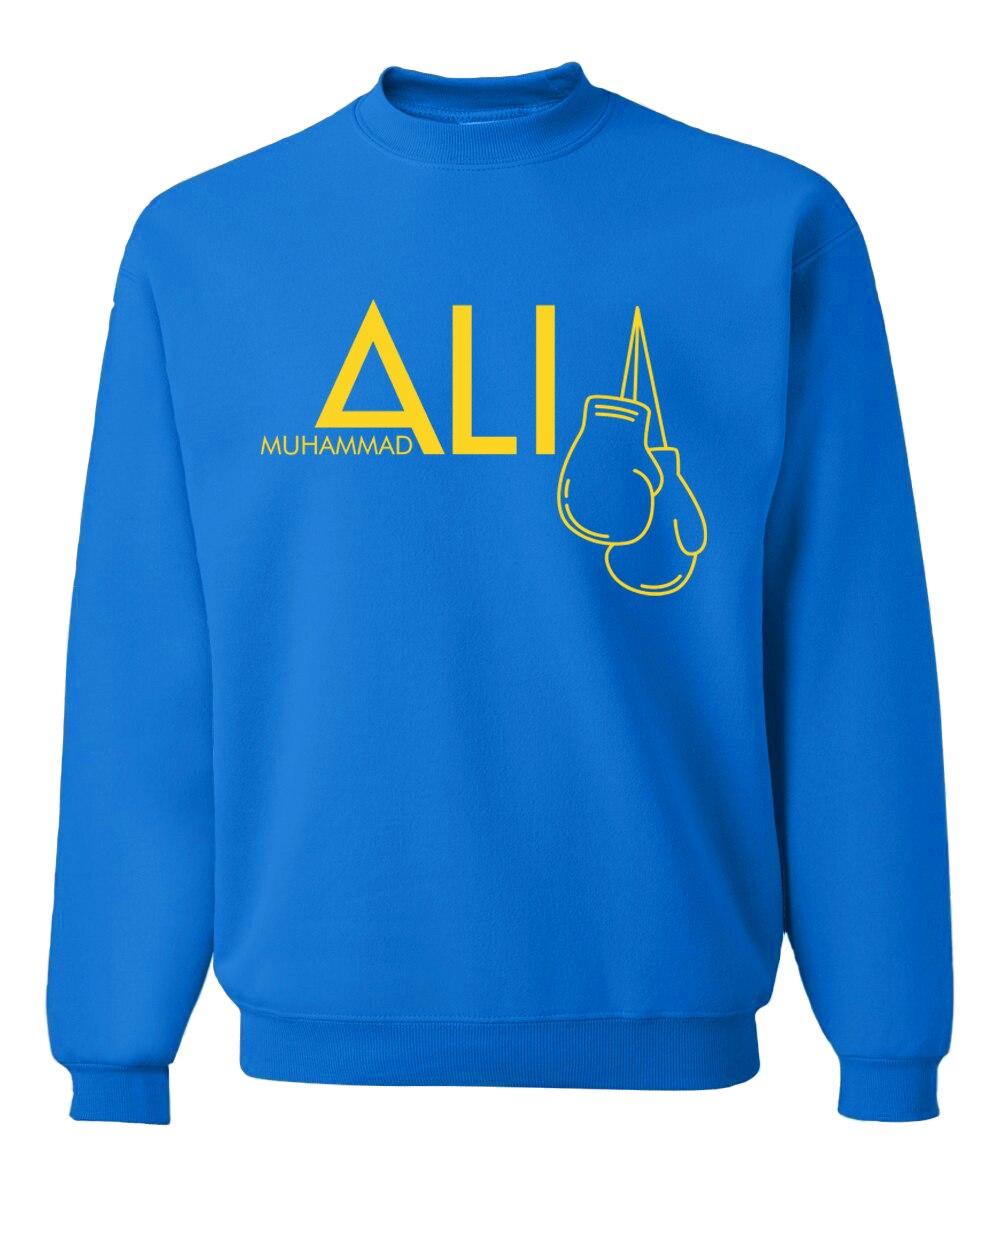 2019 new sweatshirt man Fitness bodybuilding Casual hoodies autumn winter men's hip-hop brand tracksuits fleece o-neck pullovers